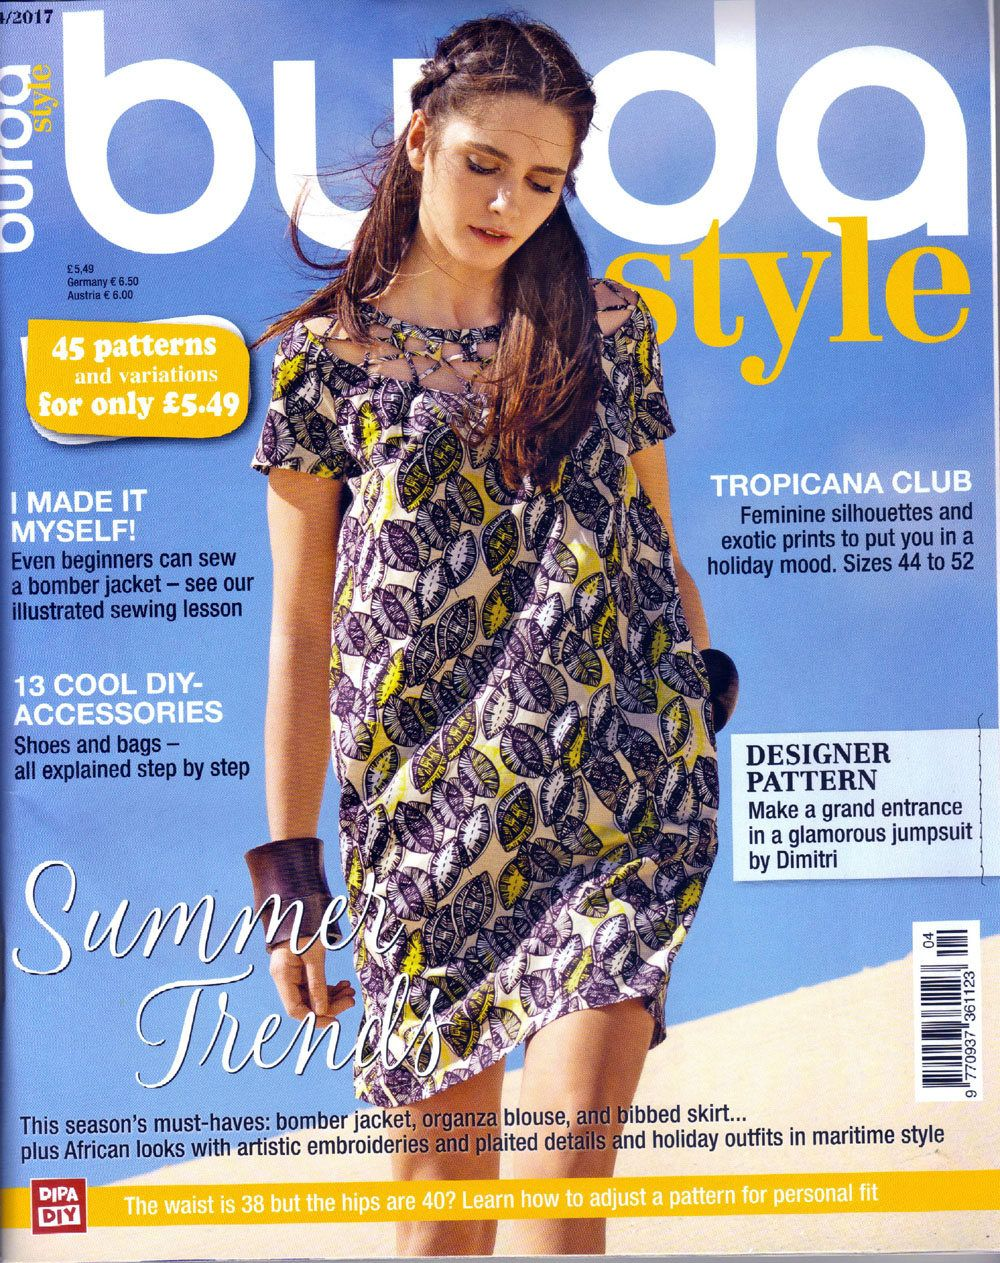 Burda style magazine 42017 english sewing patterns by burda style magazine 42017 english sewing patterns by honeyjamsuniques on etsy jeuxipadfo Image collections